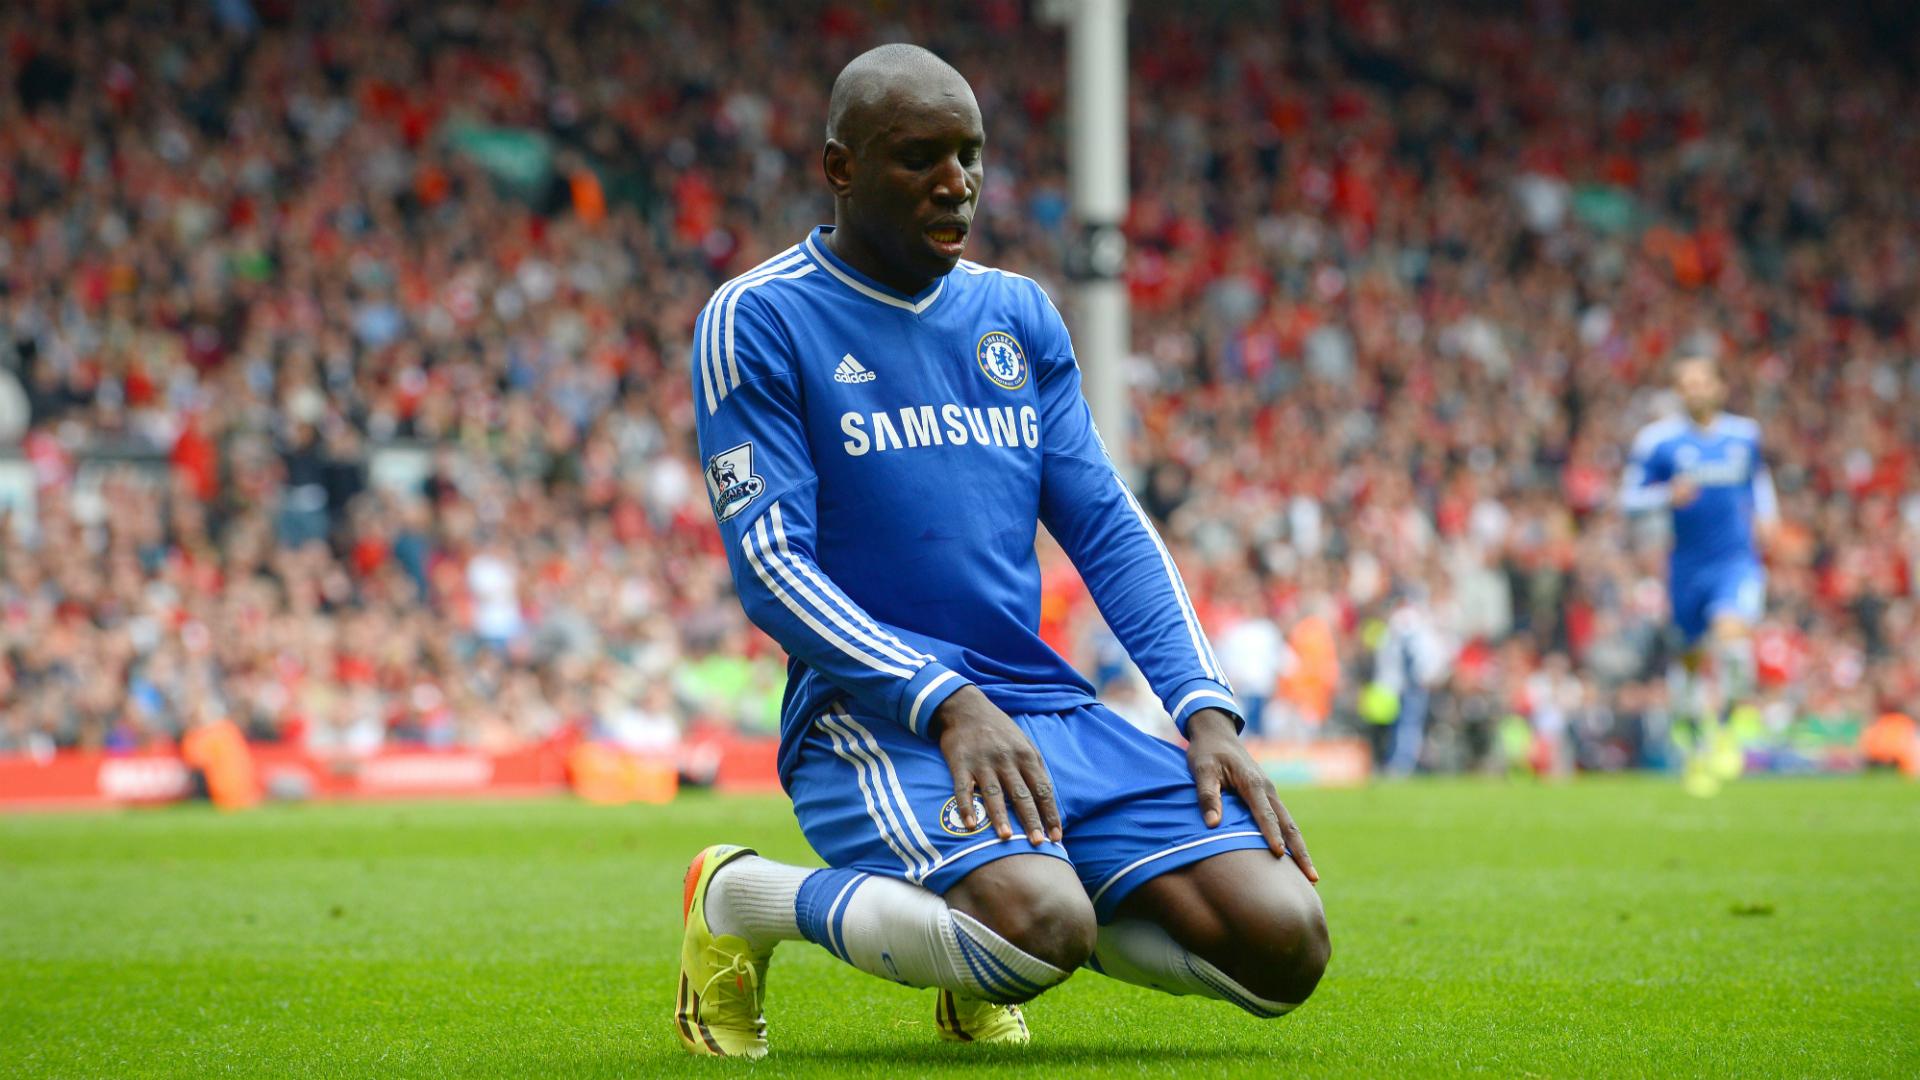 Demba Ba: Former Chelsea and Senegal striker retires from football